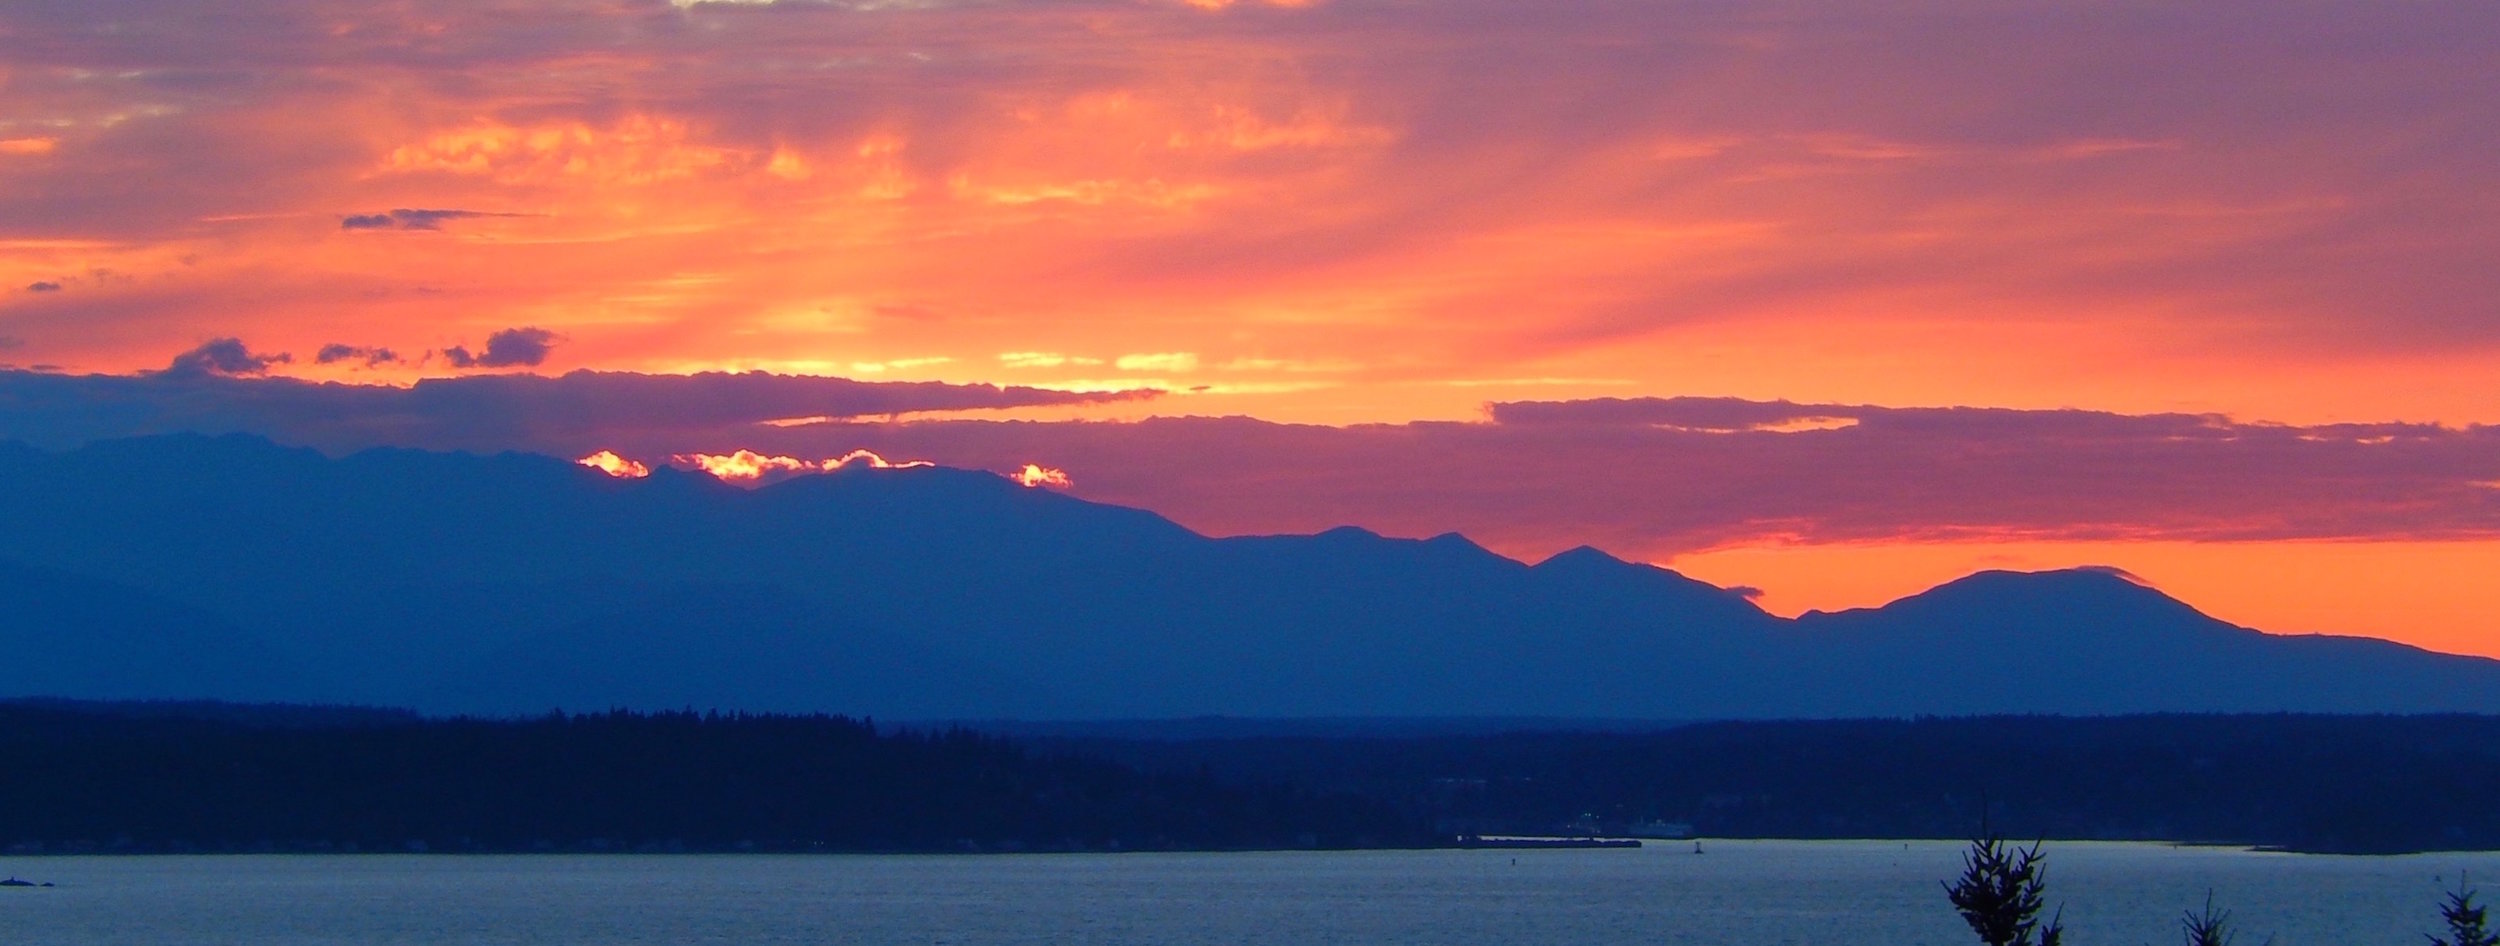 puget-sound-sunset.jpg